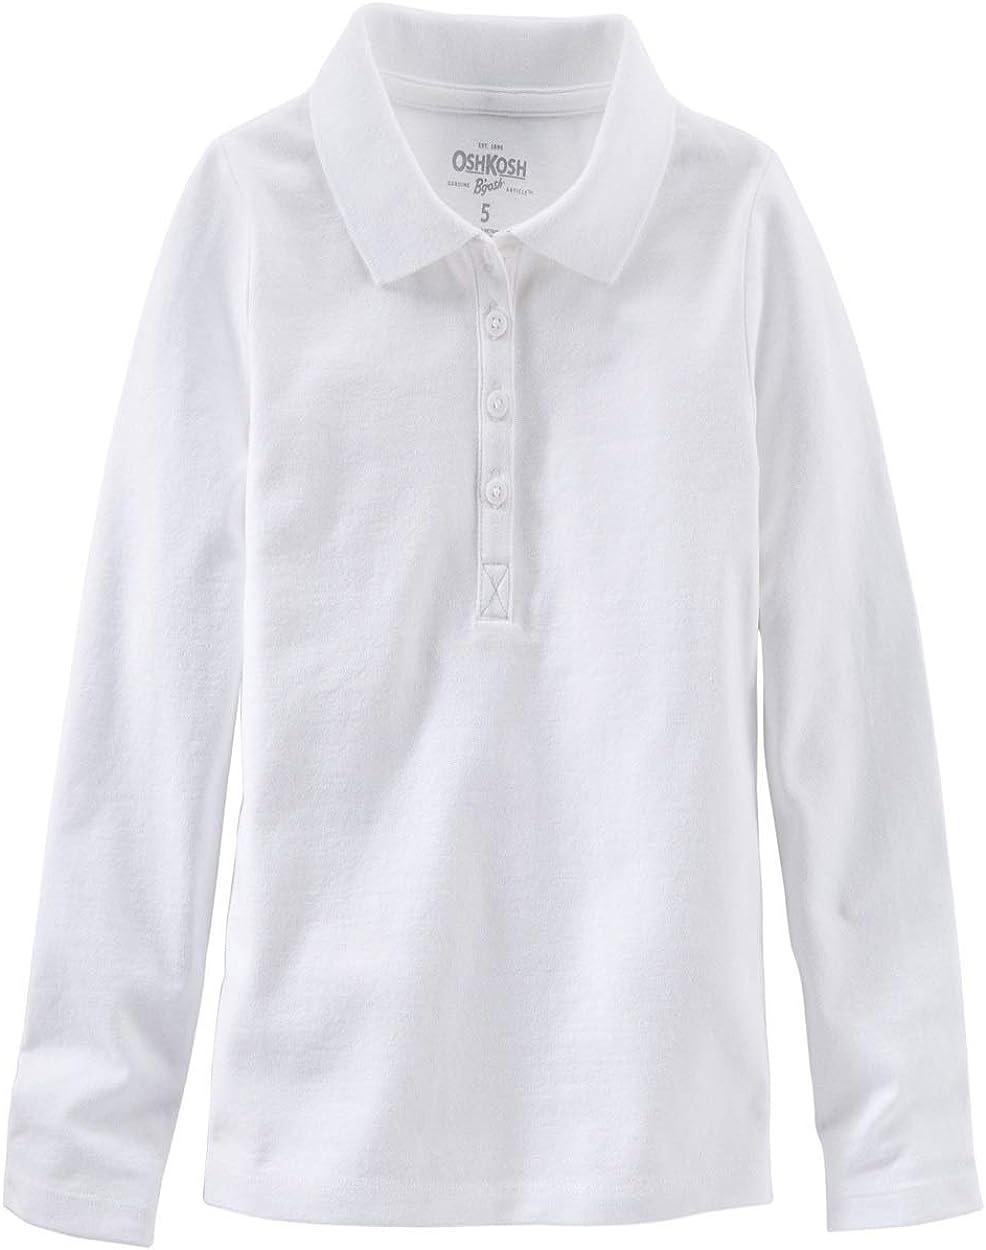 OshKosh B'gosh Little Boys' White Long Sleeve Piqué Polo Kids